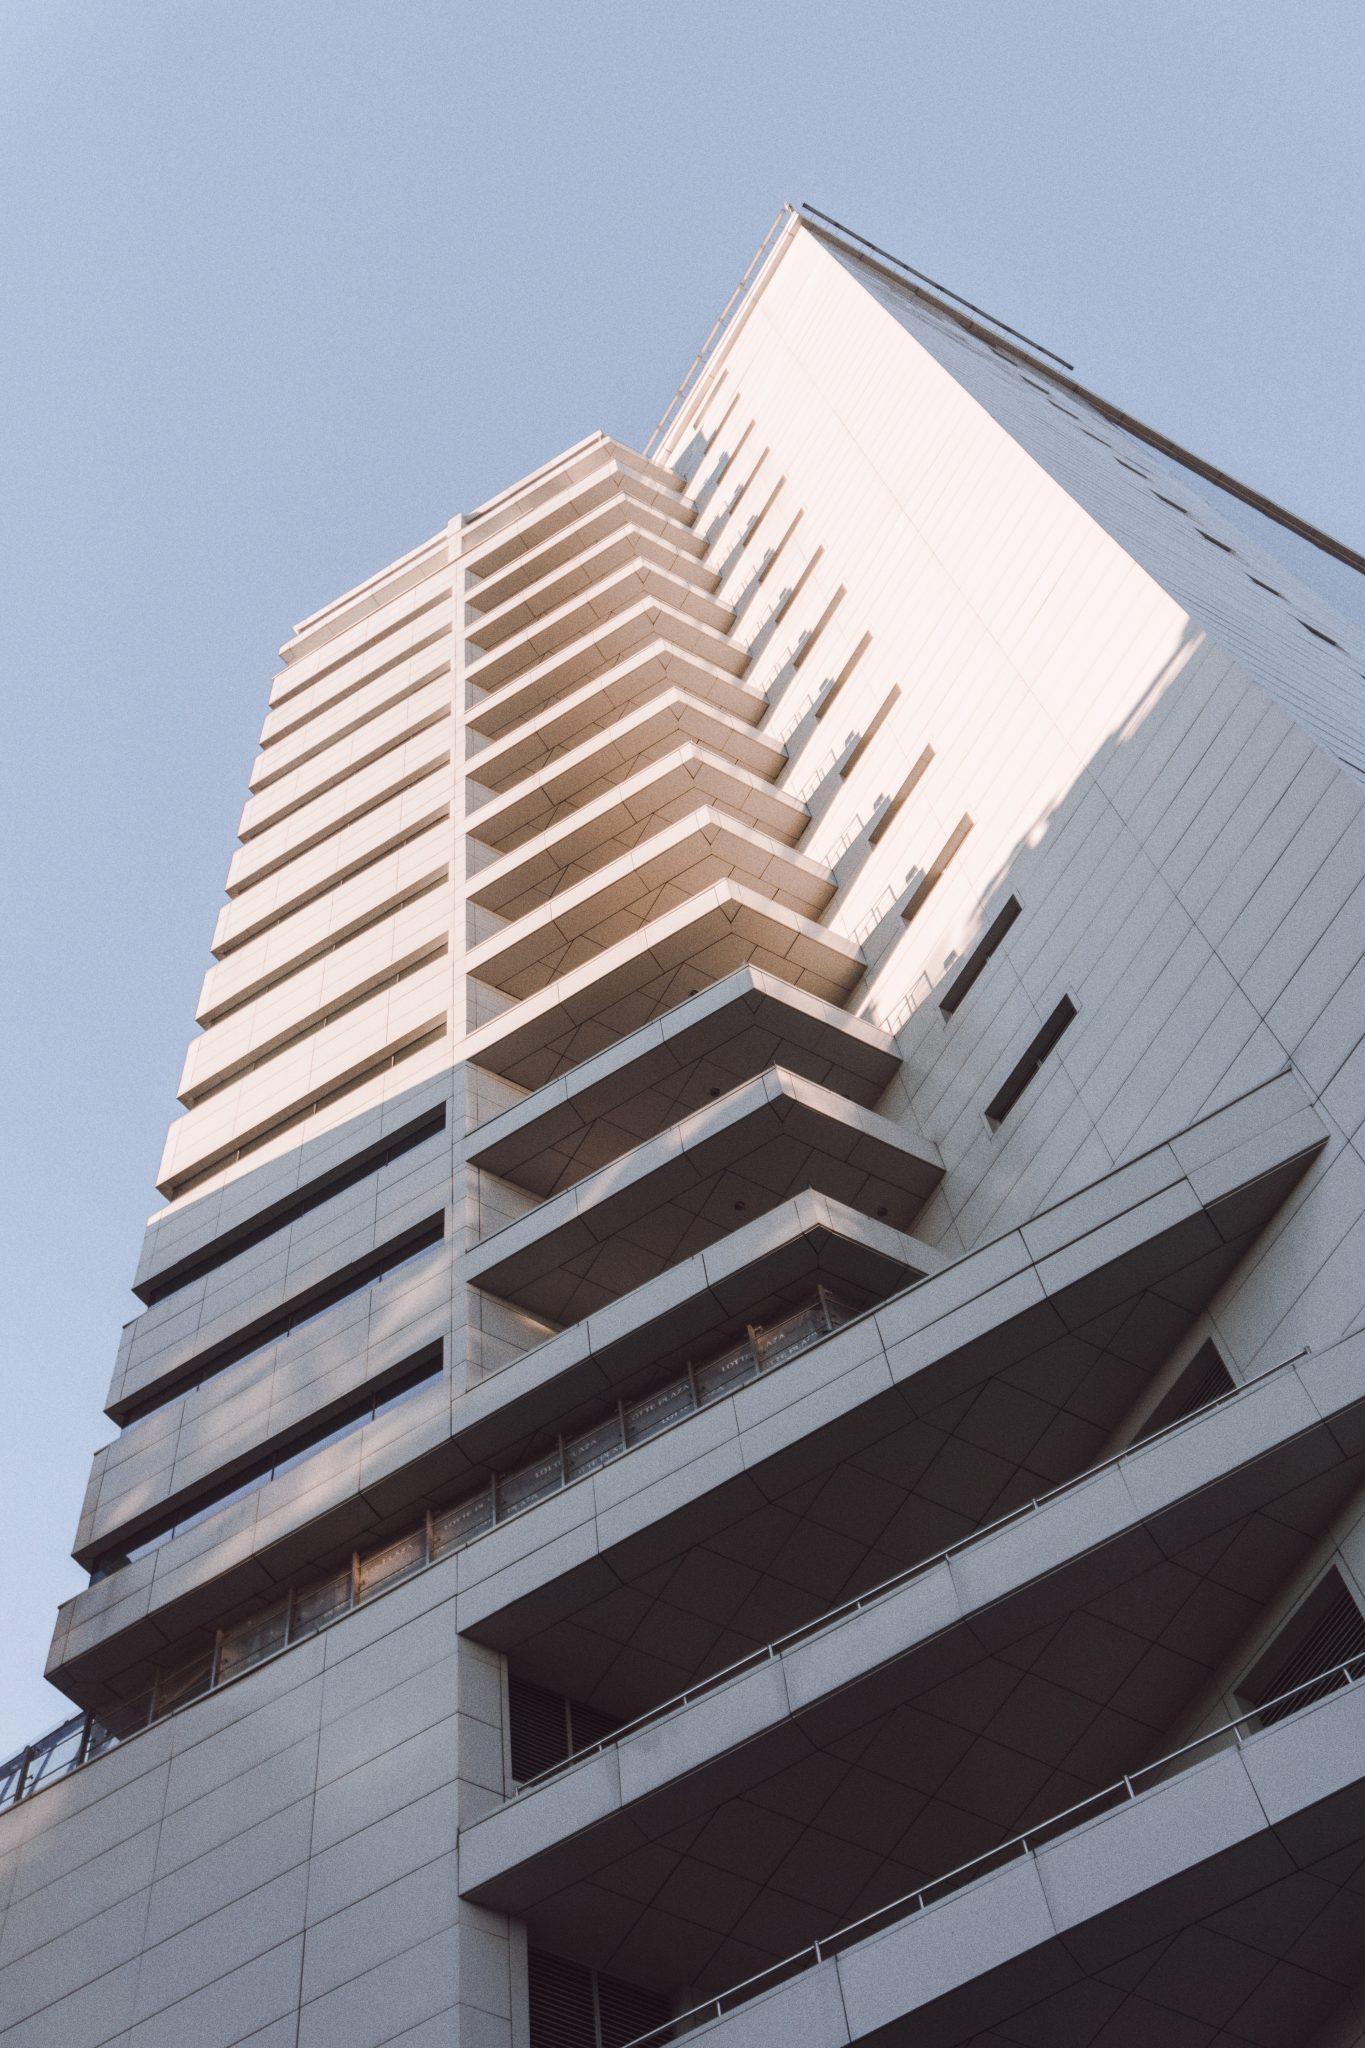 edificio-distribuicao-publicidade-ars